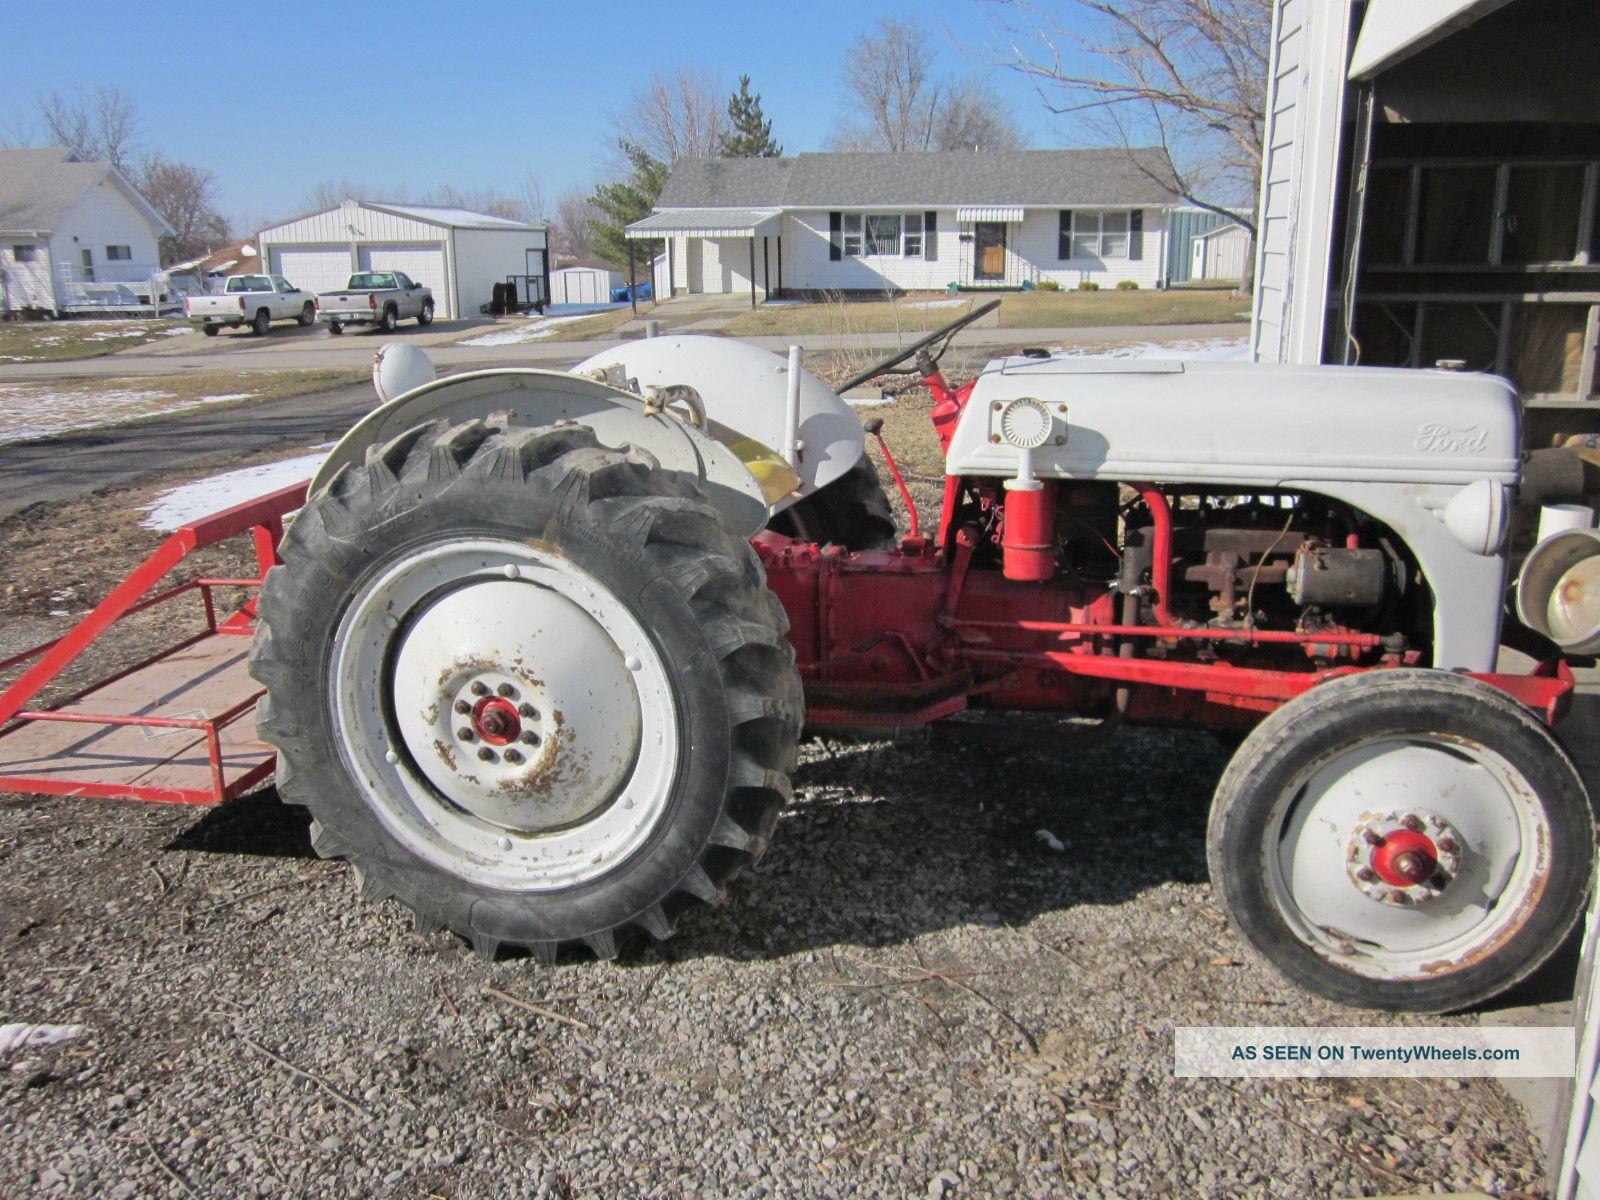 Sherman Backhoes For Ford Tractors : Ford sherman backhoe